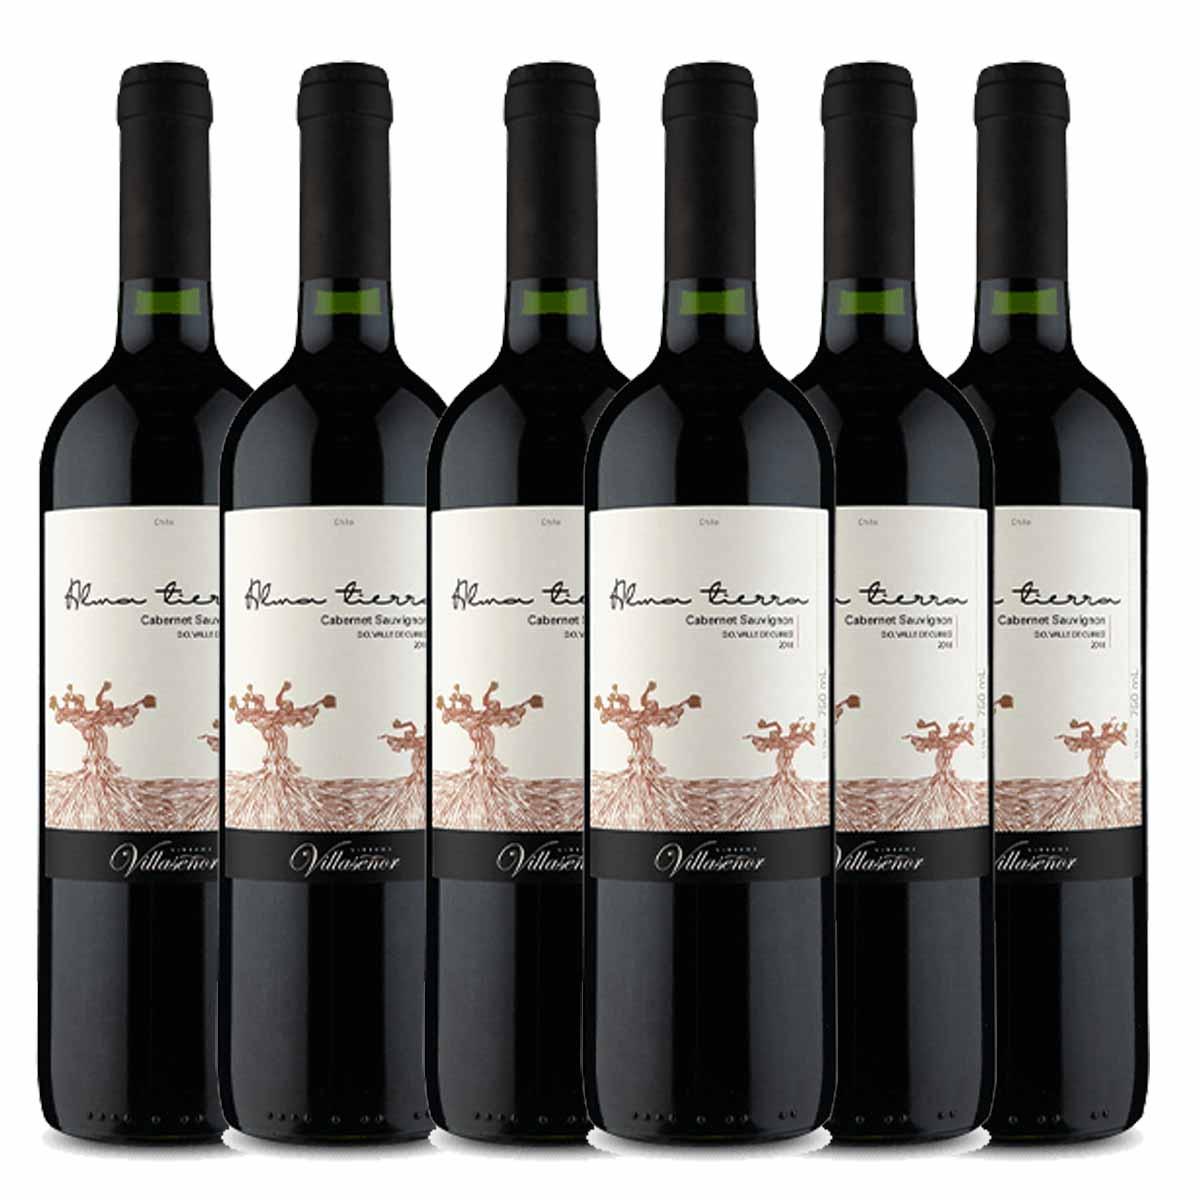 Kit6 Vinho Tinto Chileno Alma Tierra Cabernet Sauvignon 2018